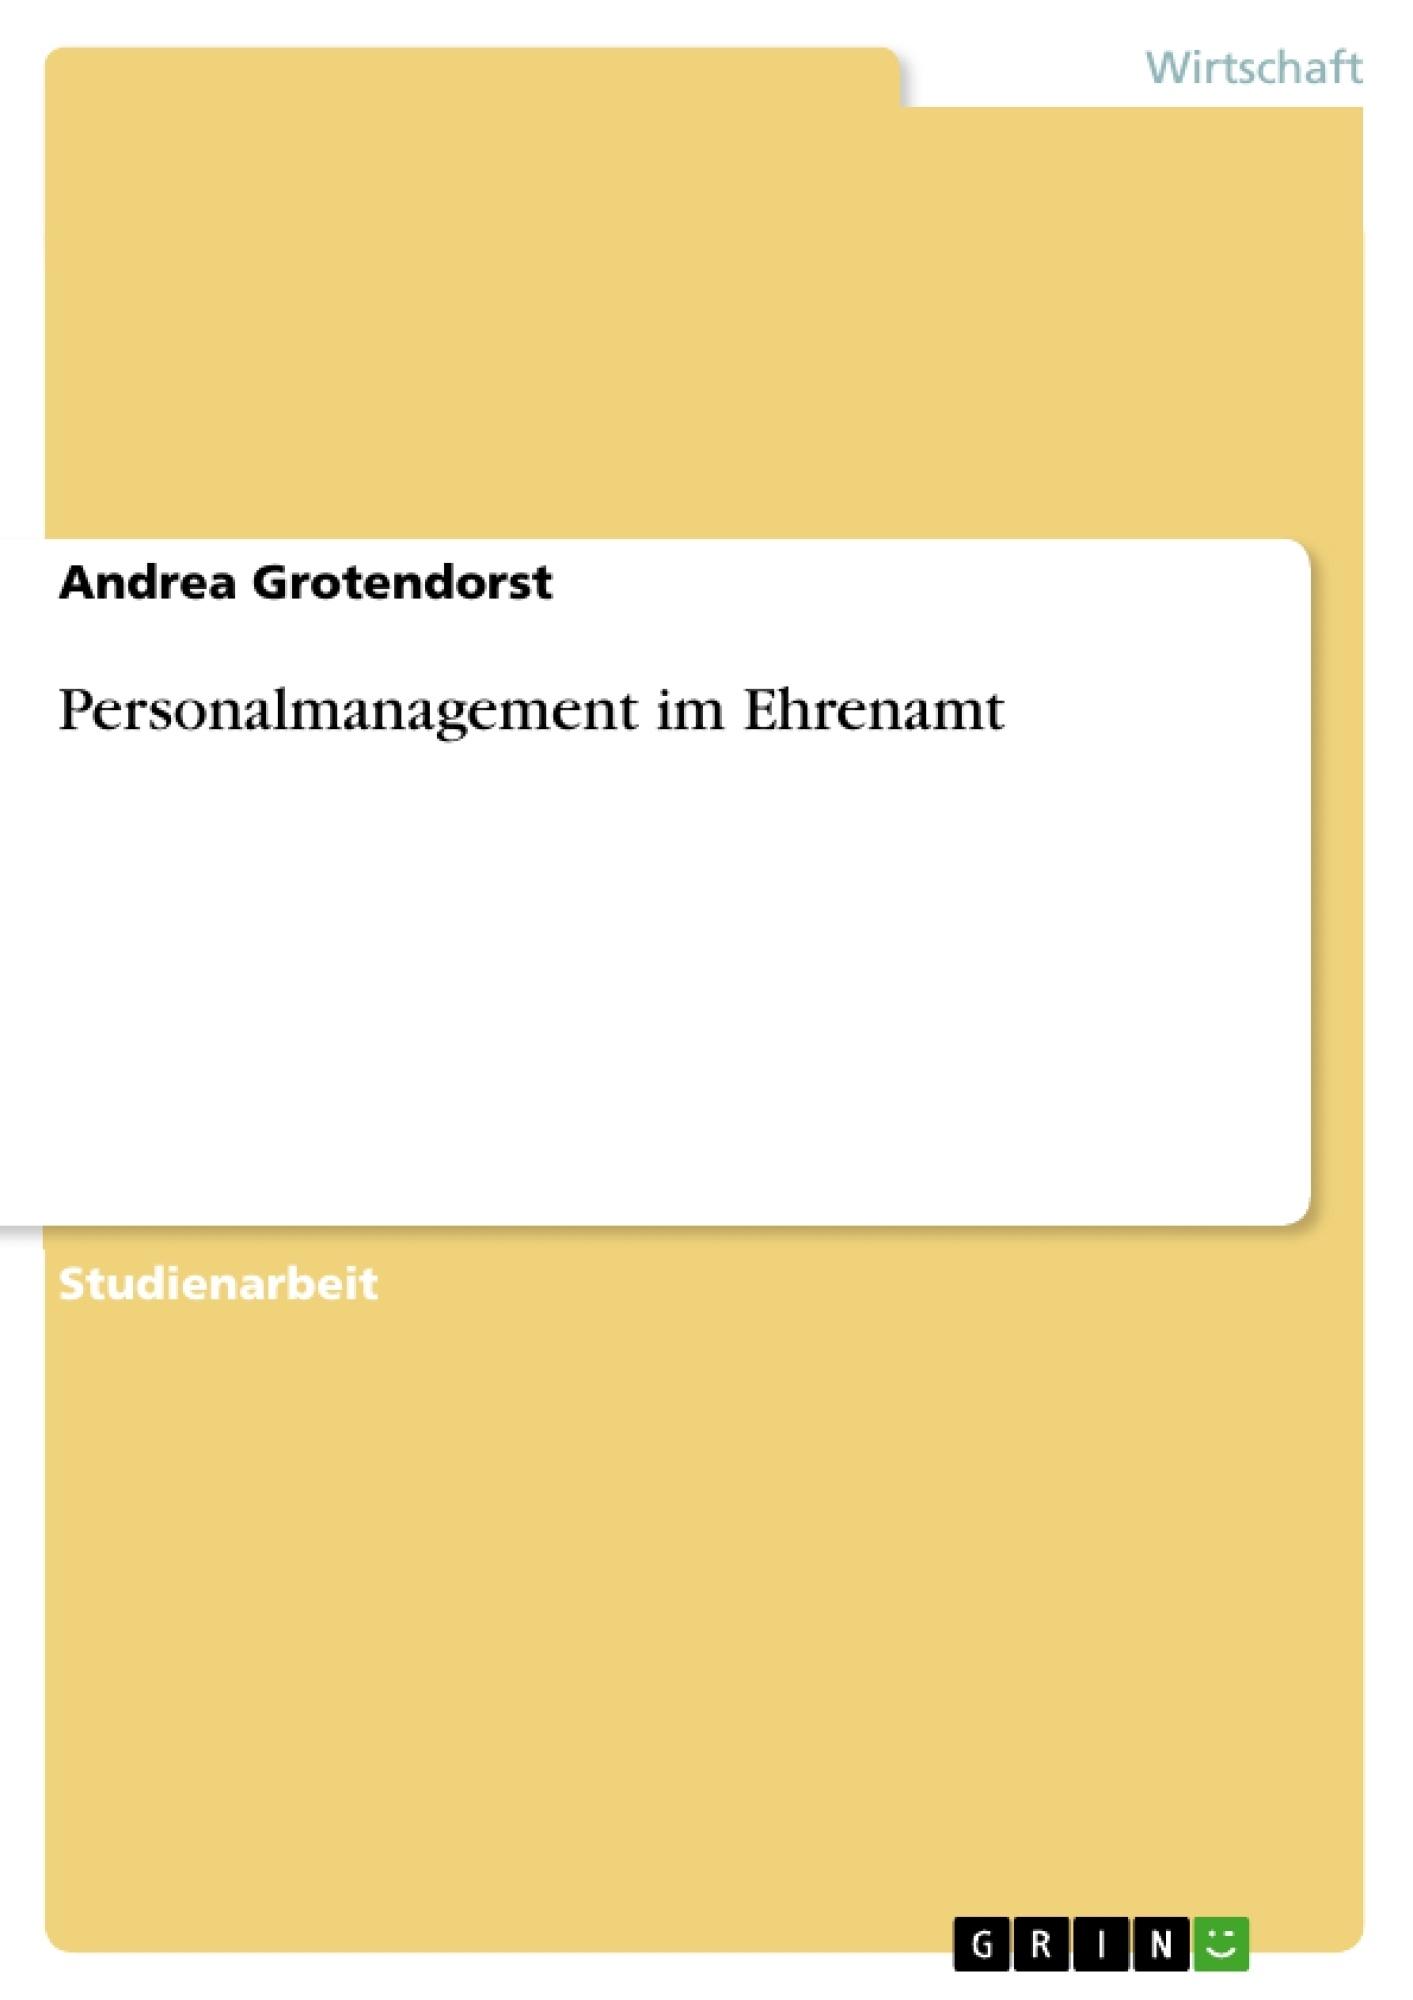 Titel: Personalmanagement im Ehrenamt